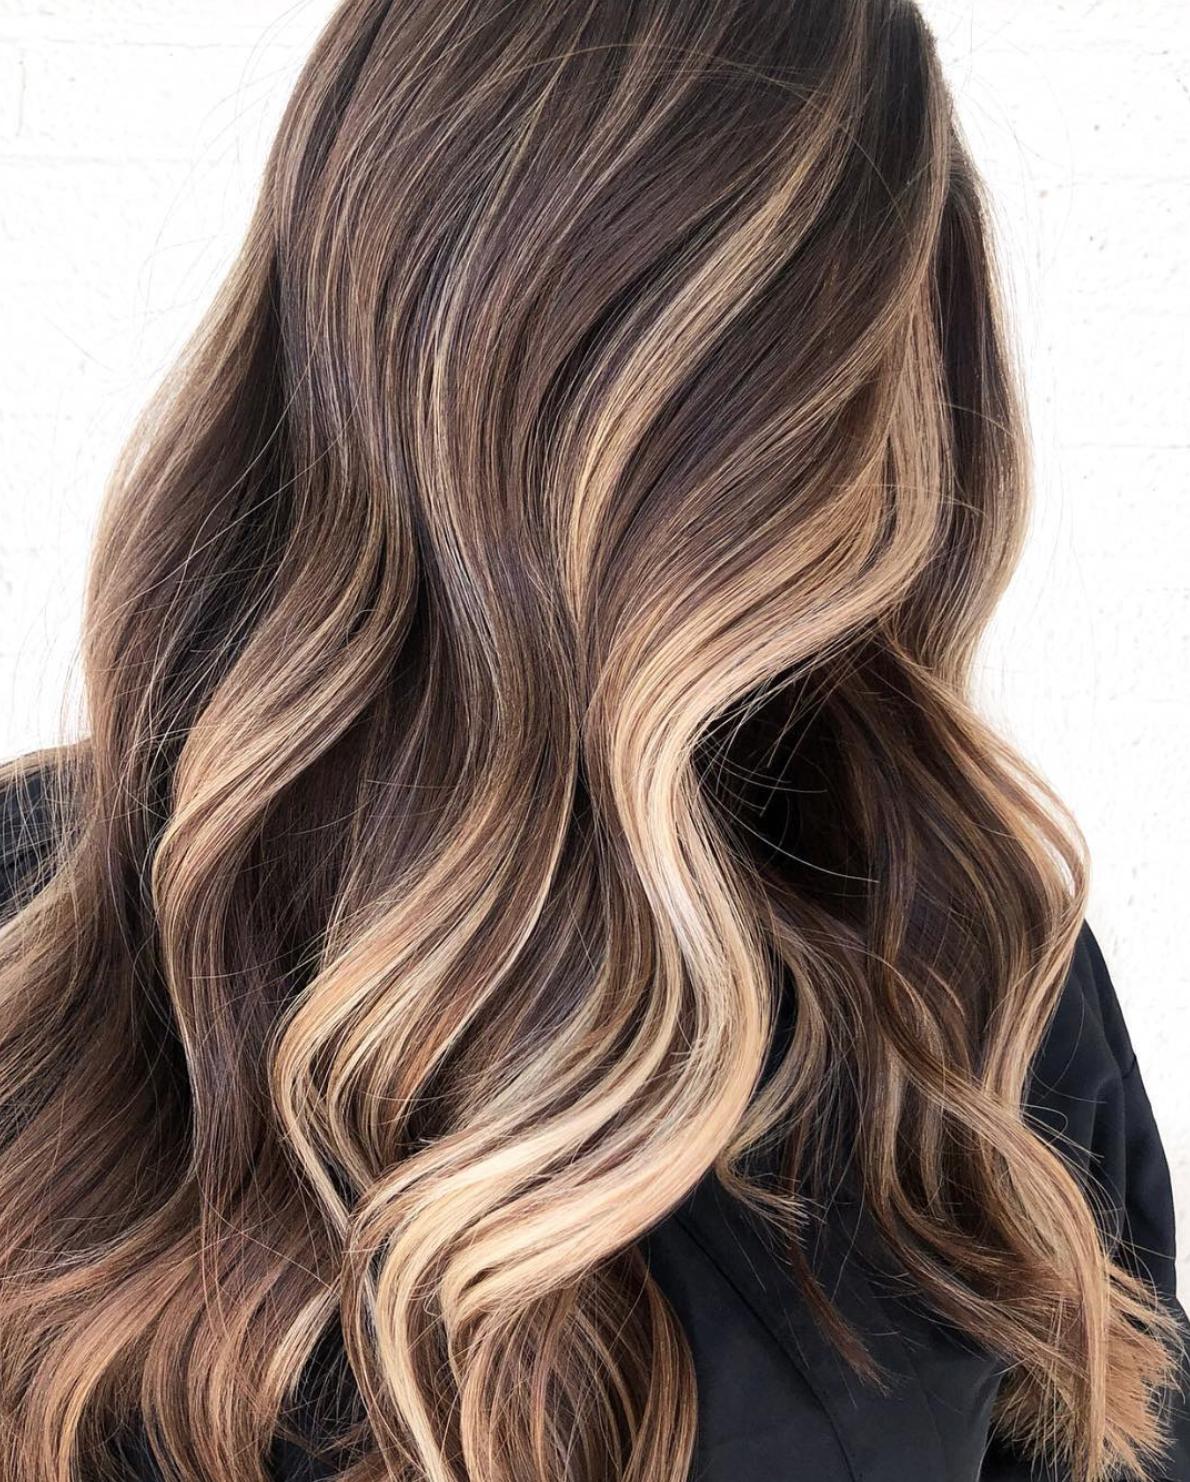 Honey Blonde Hair Regarding Preferred Curls Hairstyles With Honey Blonde Balayage (View 4 of 20)